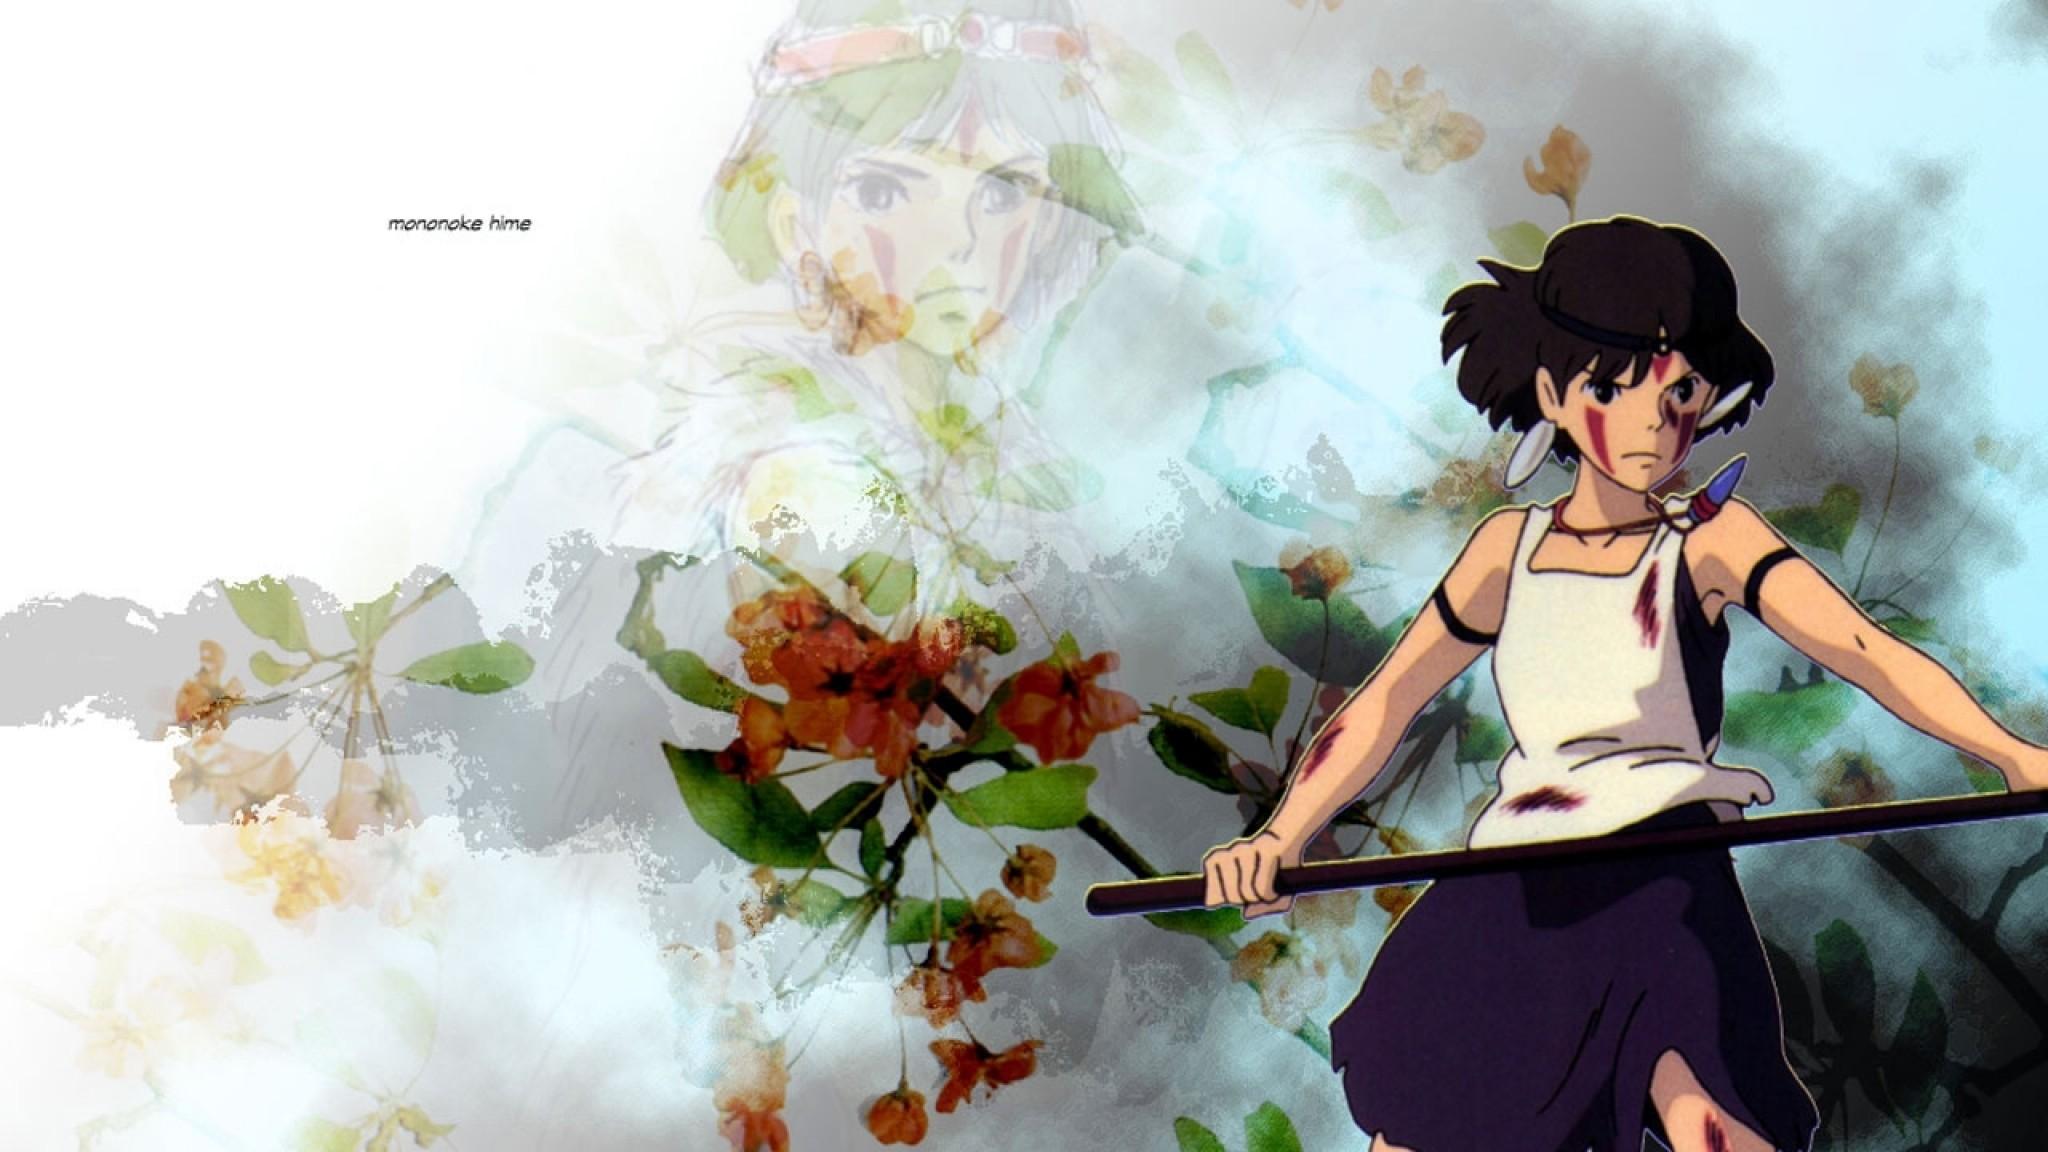 Wallpaper princess mononoke, girl, sword, blow, weapons,  preparedness, flowers